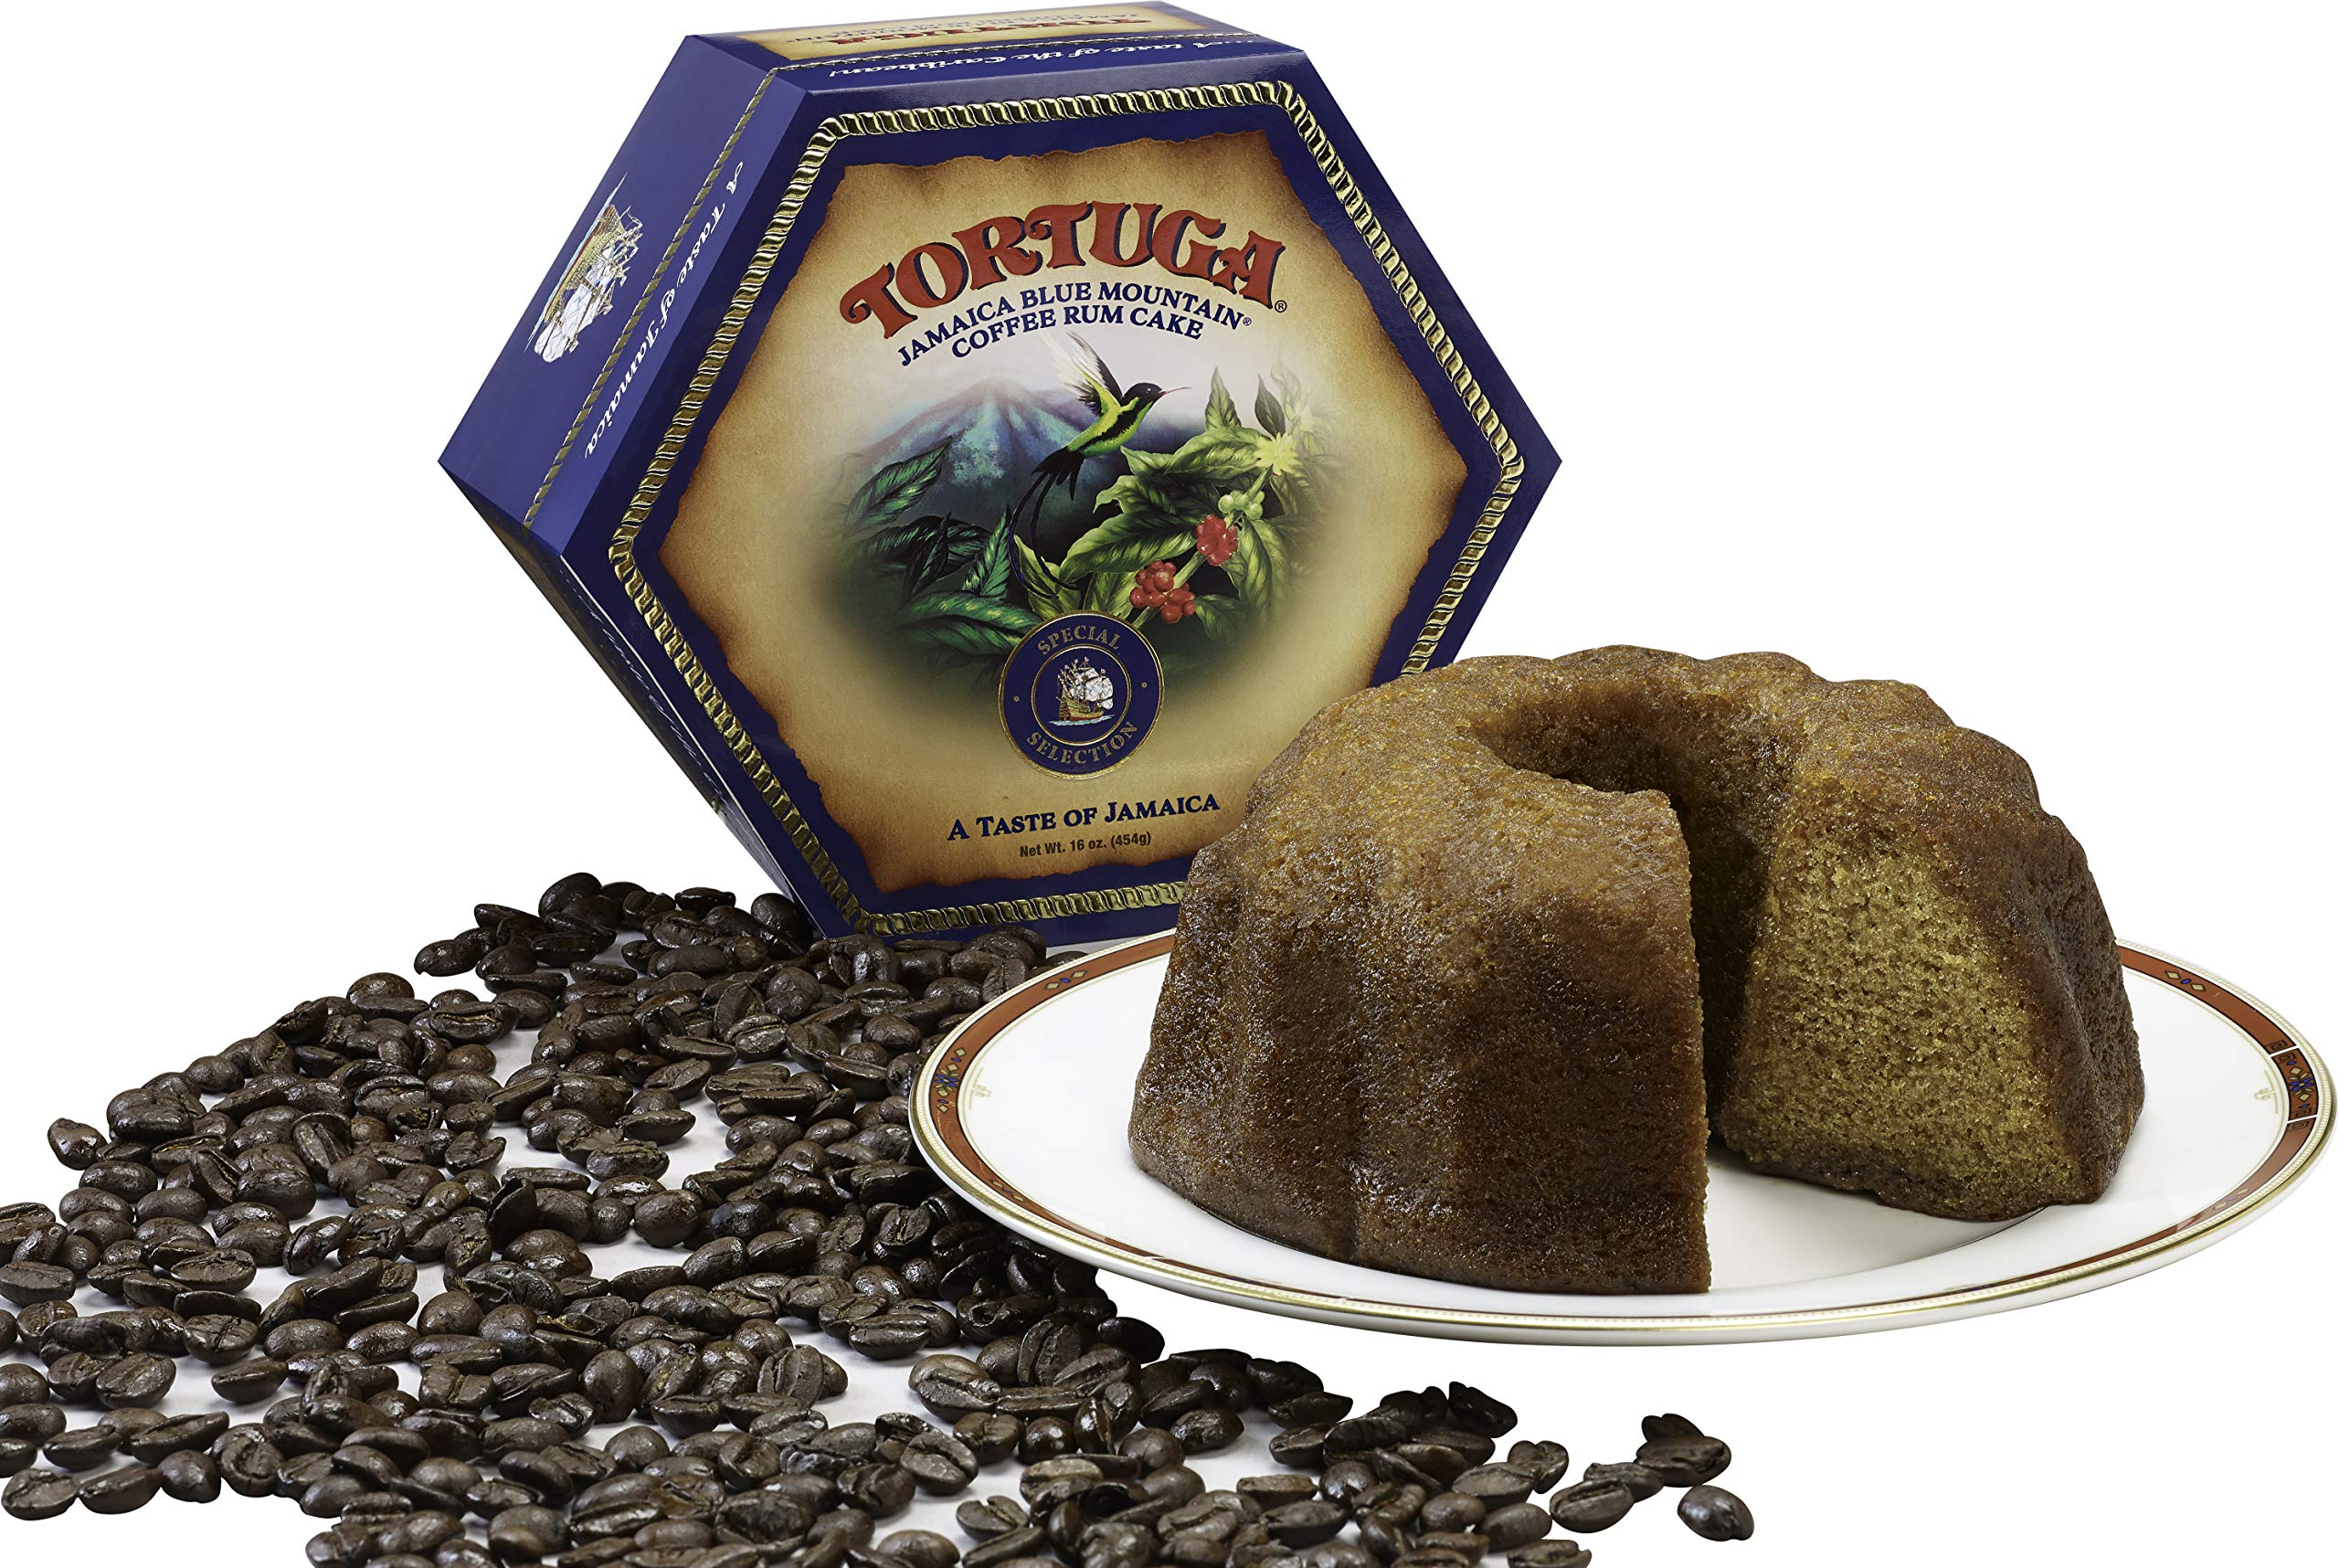 TORTUGA Caribbean Blue Mountain Rum Cake - 32 oz. - The Perfect Premium Gourmet Gift by TORTUGA (Image #5)